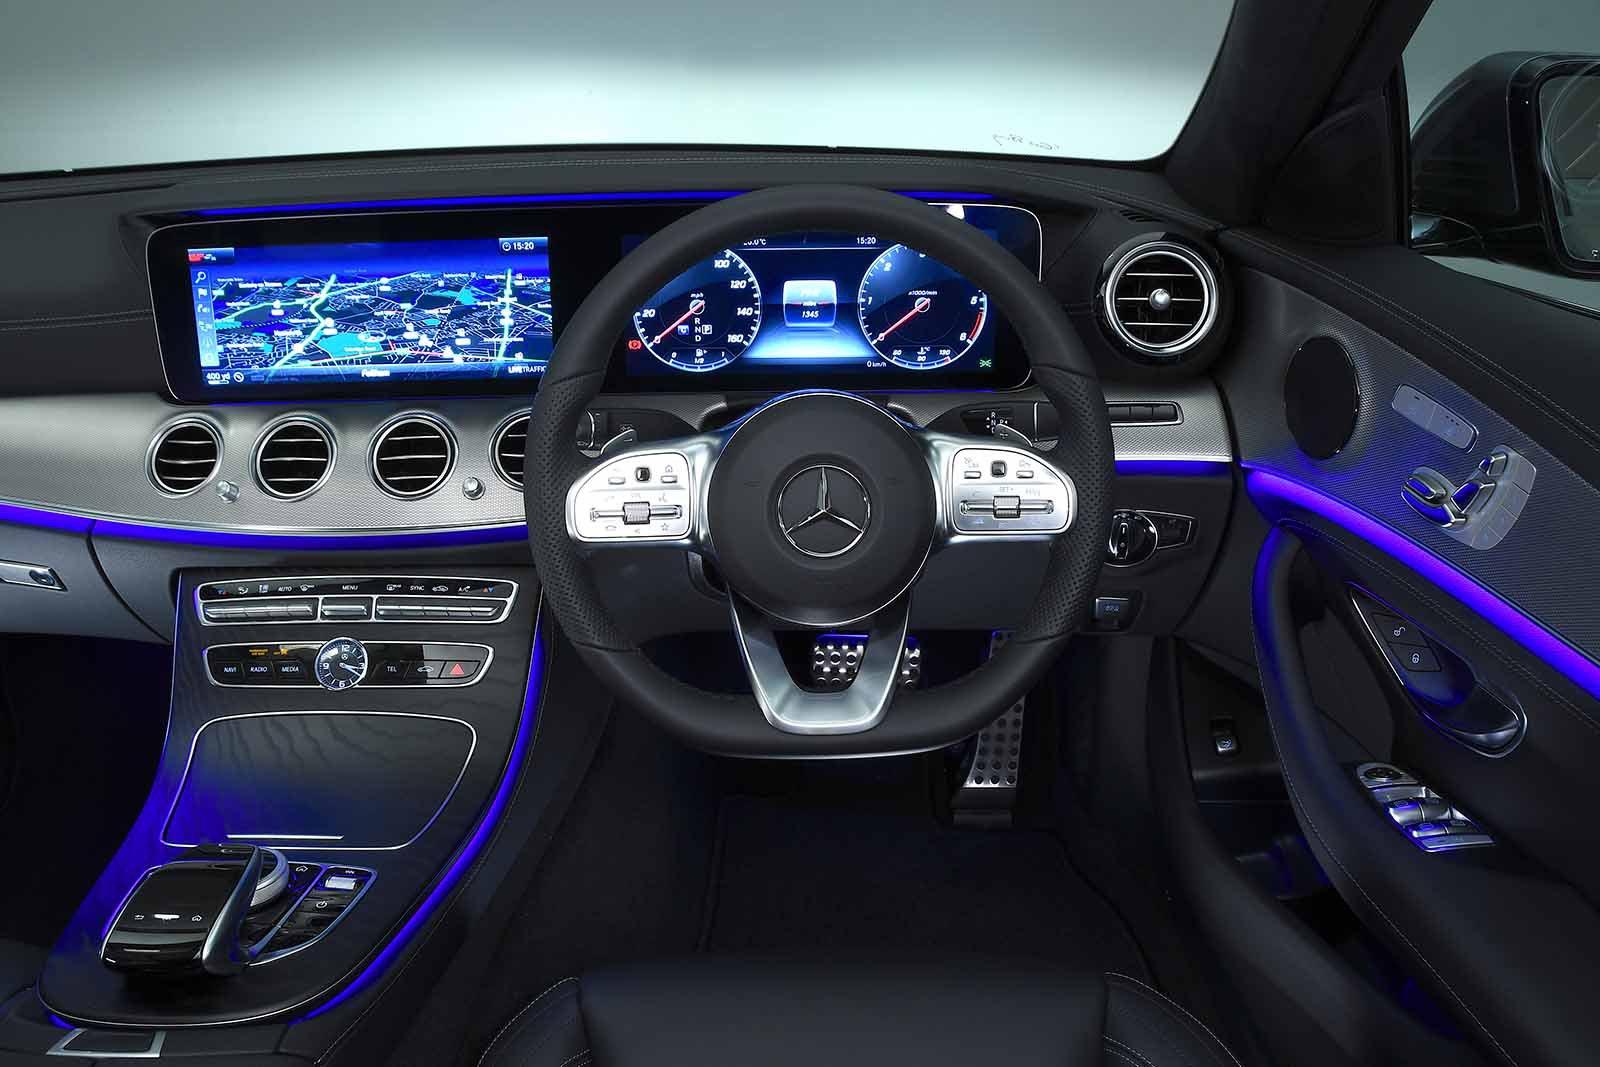 Mercedes-Benz 2019 E-Class saloon RHD dashboard